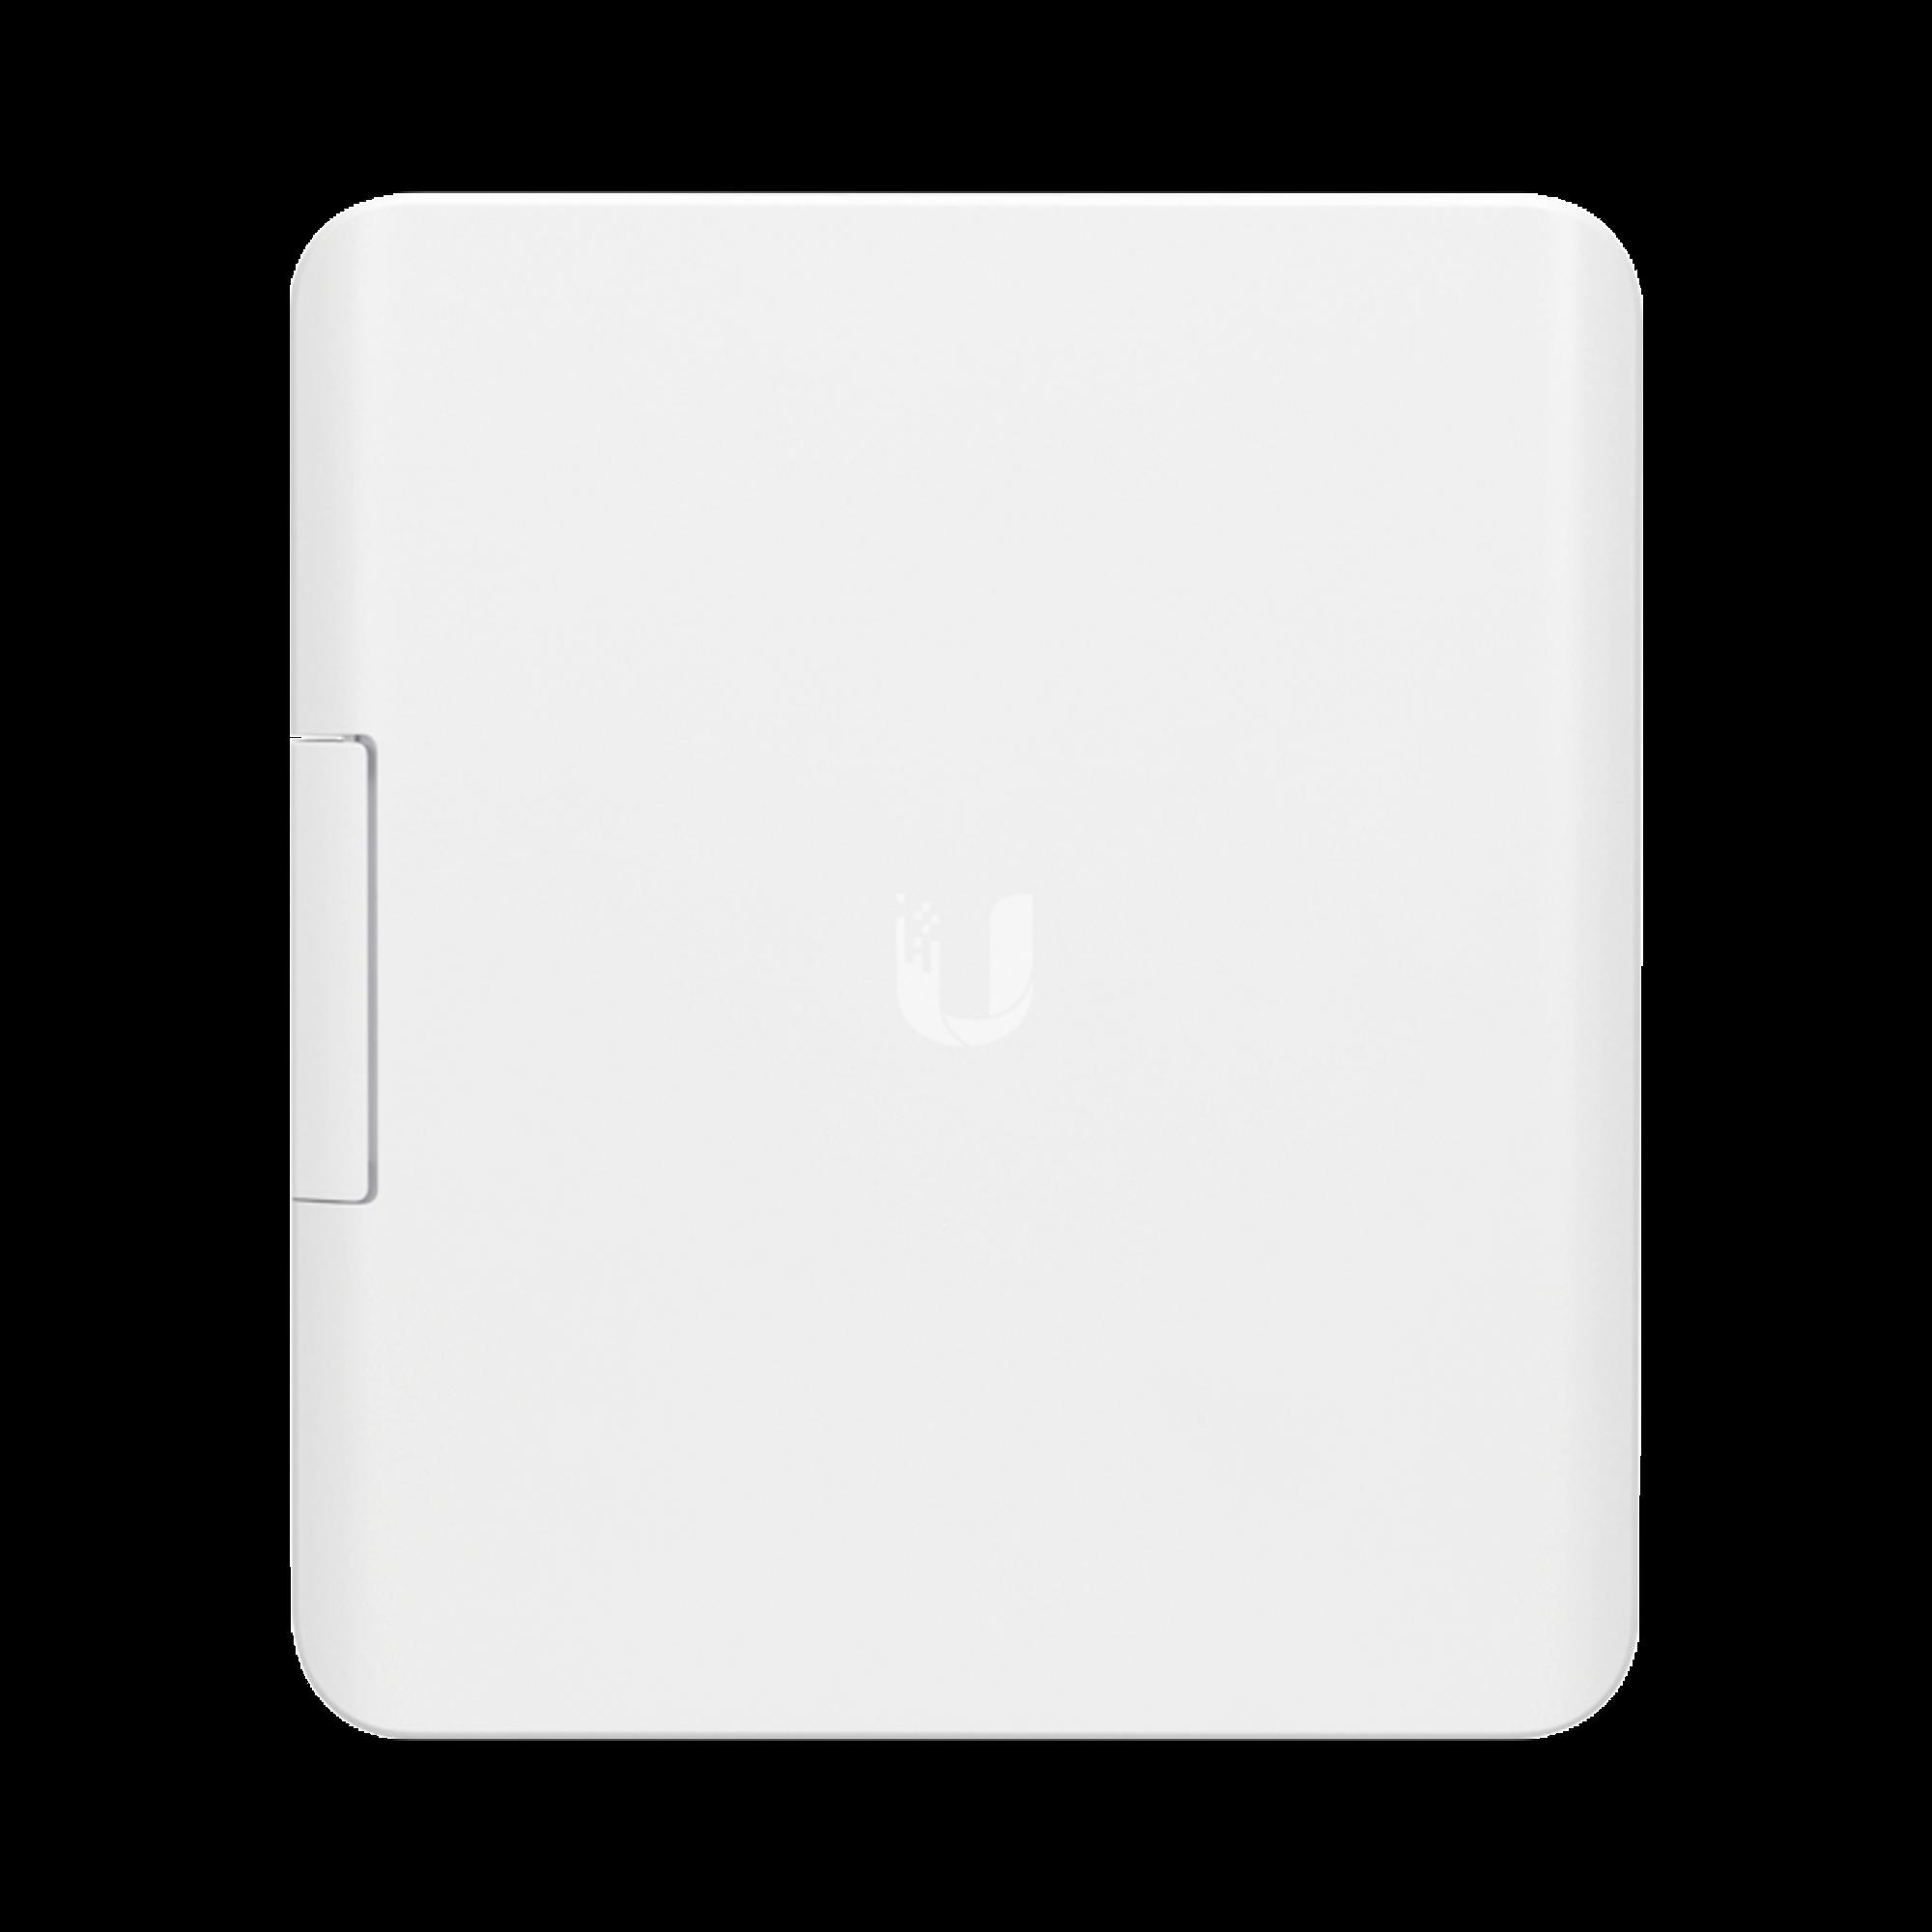 Kit Adaptador para Switch USW-Flex resistente para exterior de montaje en poste